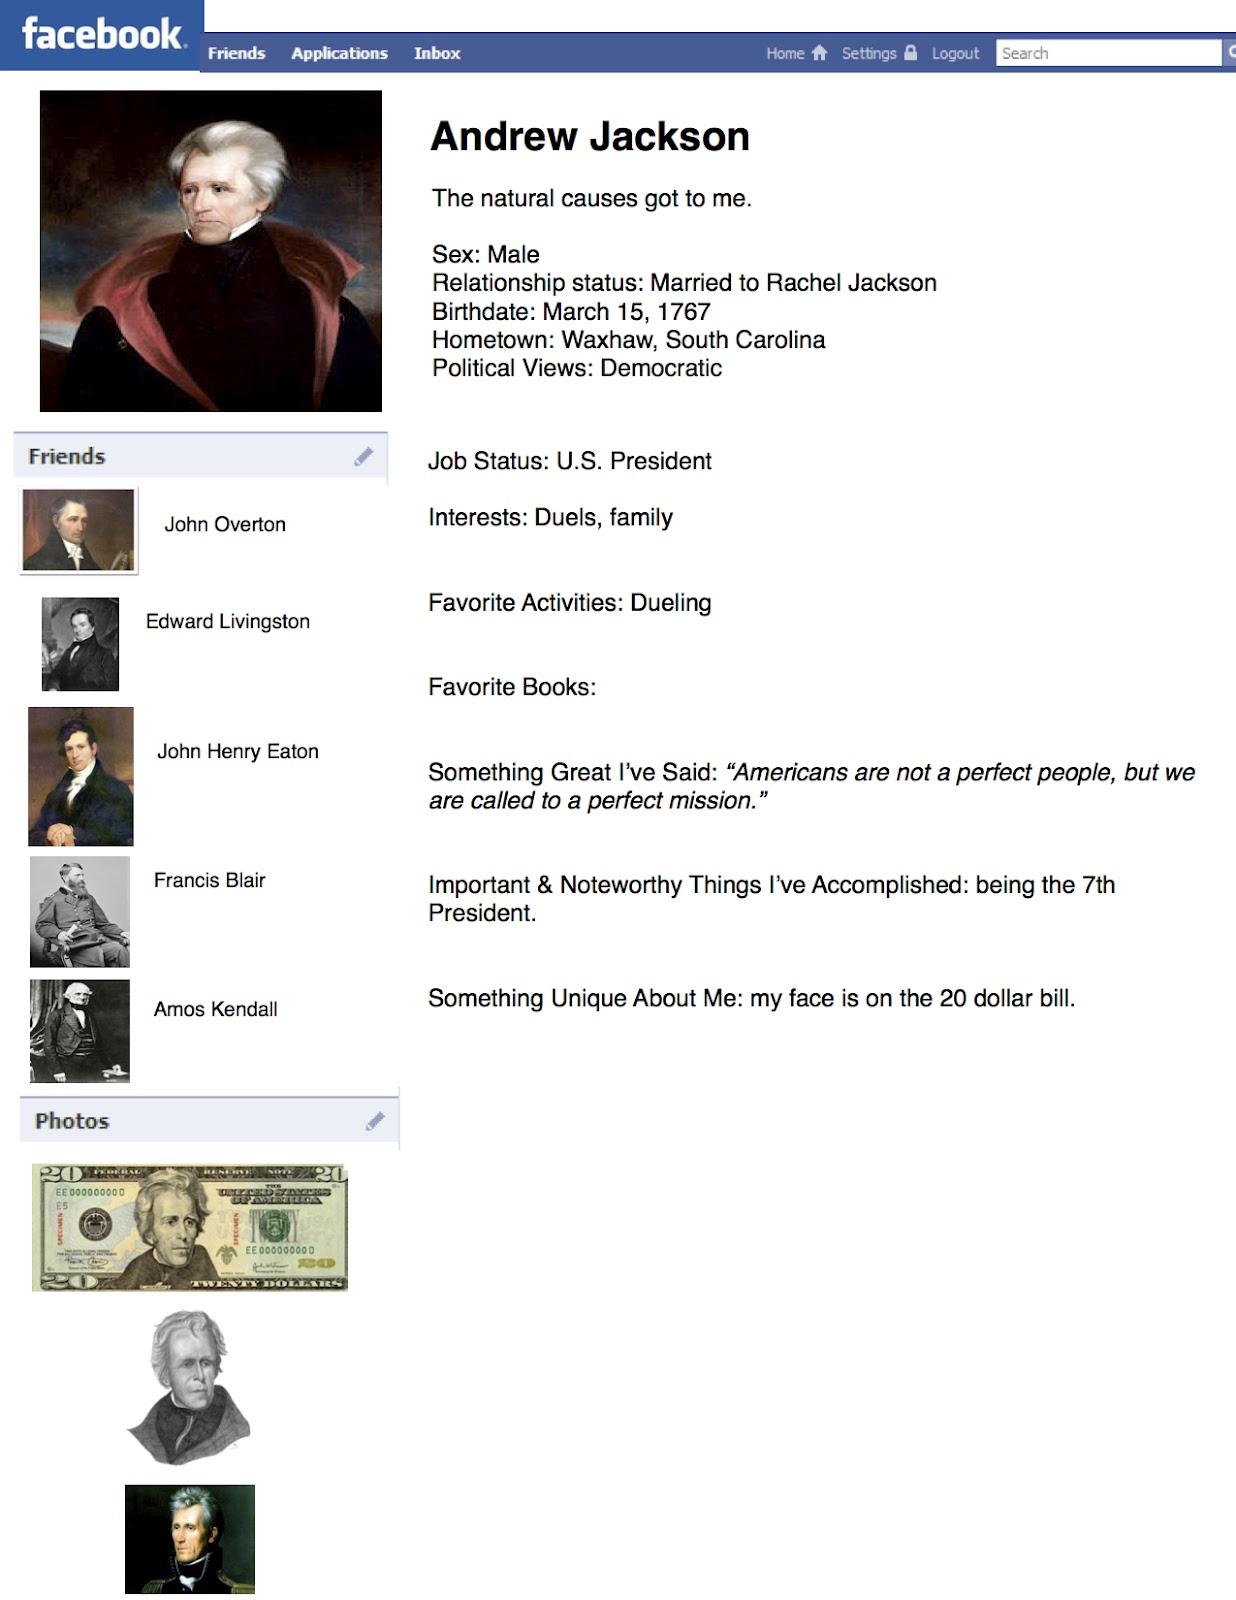 worksheet Andrew Jackson Worksheet for school profiles the german presented their double decker profiles